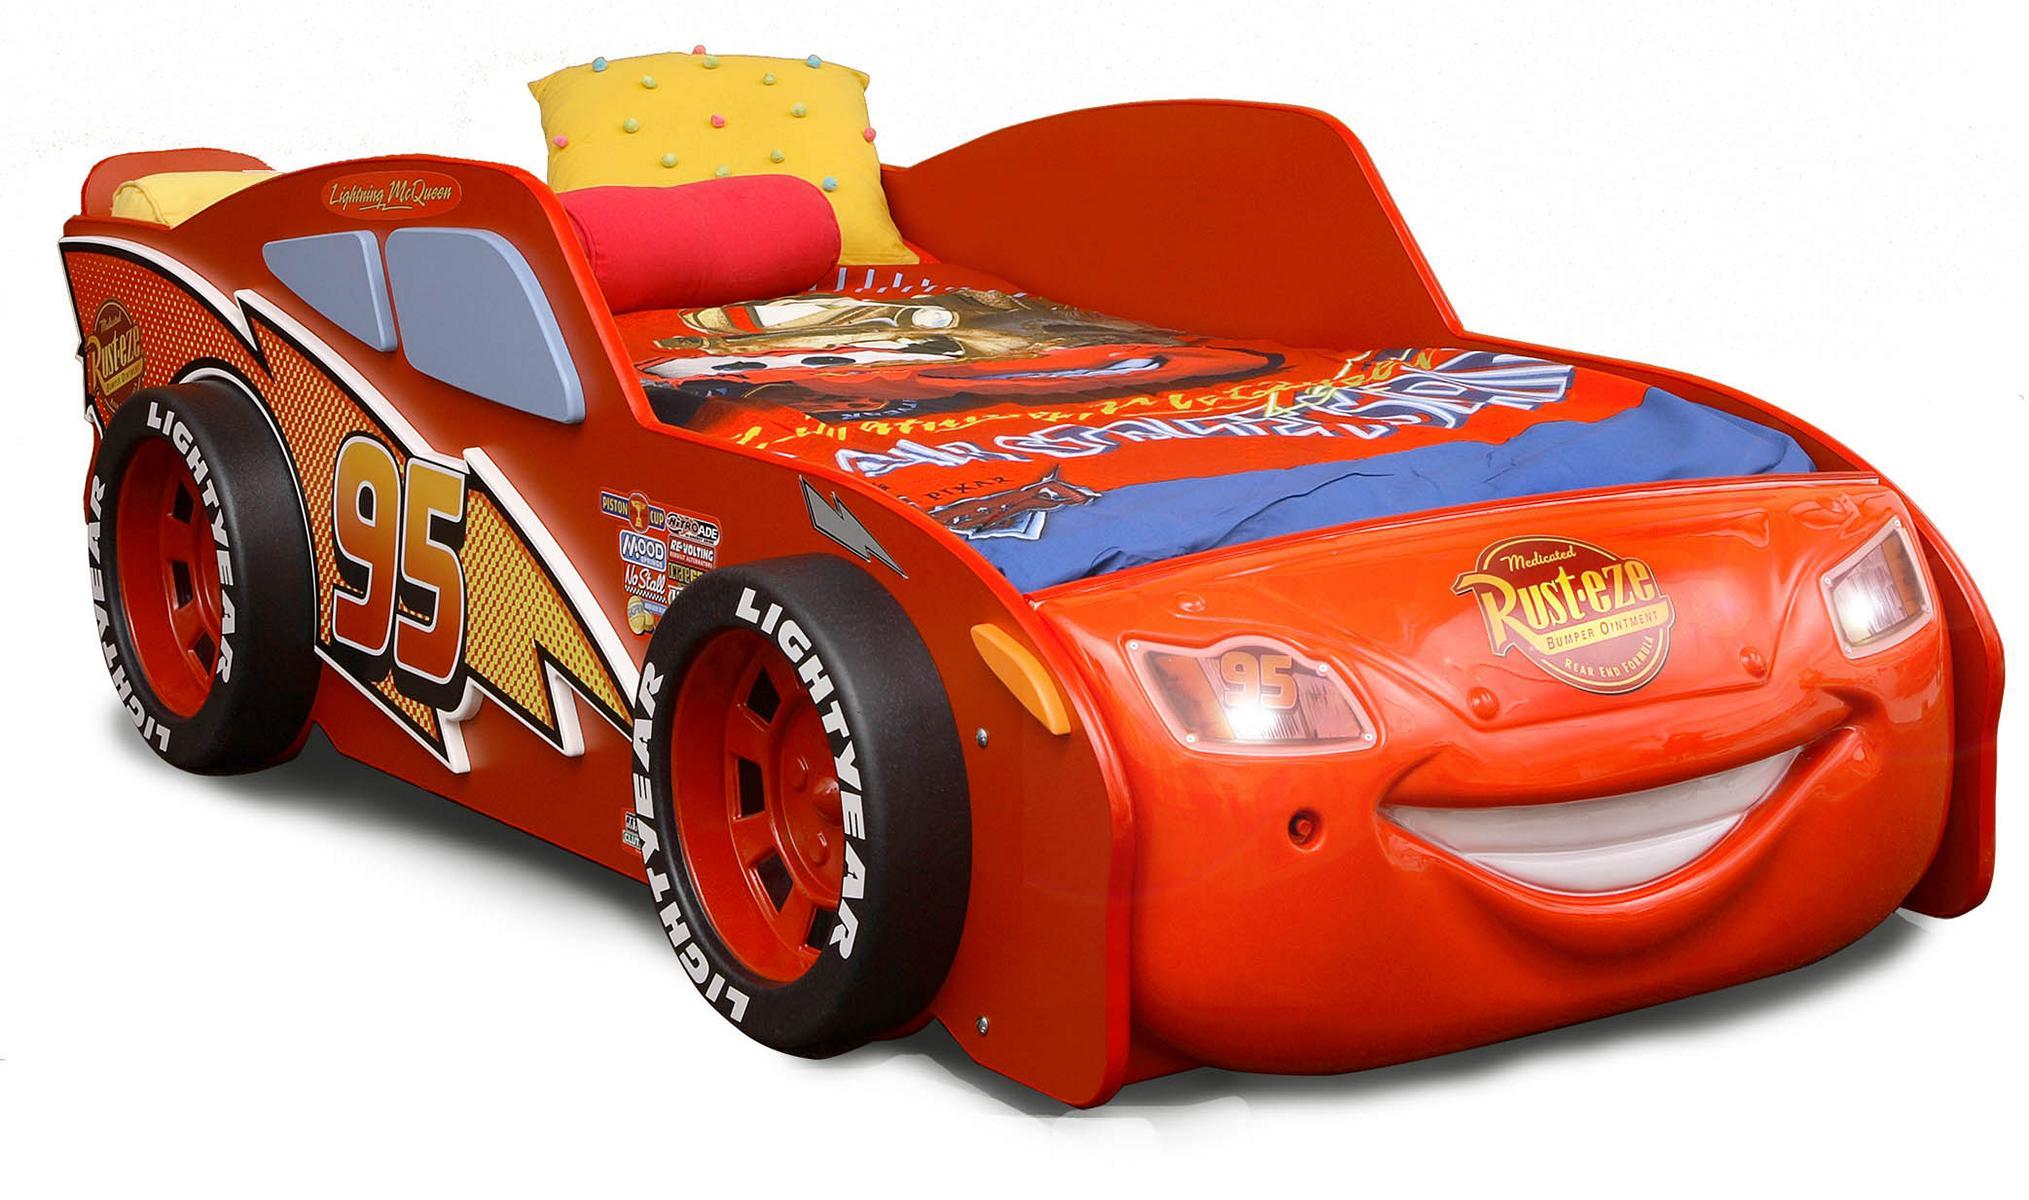 Full Size of Rennwagen Auto Bett Mit Matratze Kinderbett In Rot Autobett Meise Betten 90x200 Lattenrost Und Nolte Möbel Boss Minion 140x220 Clinique Even Better Foundation Bett Cars Bett